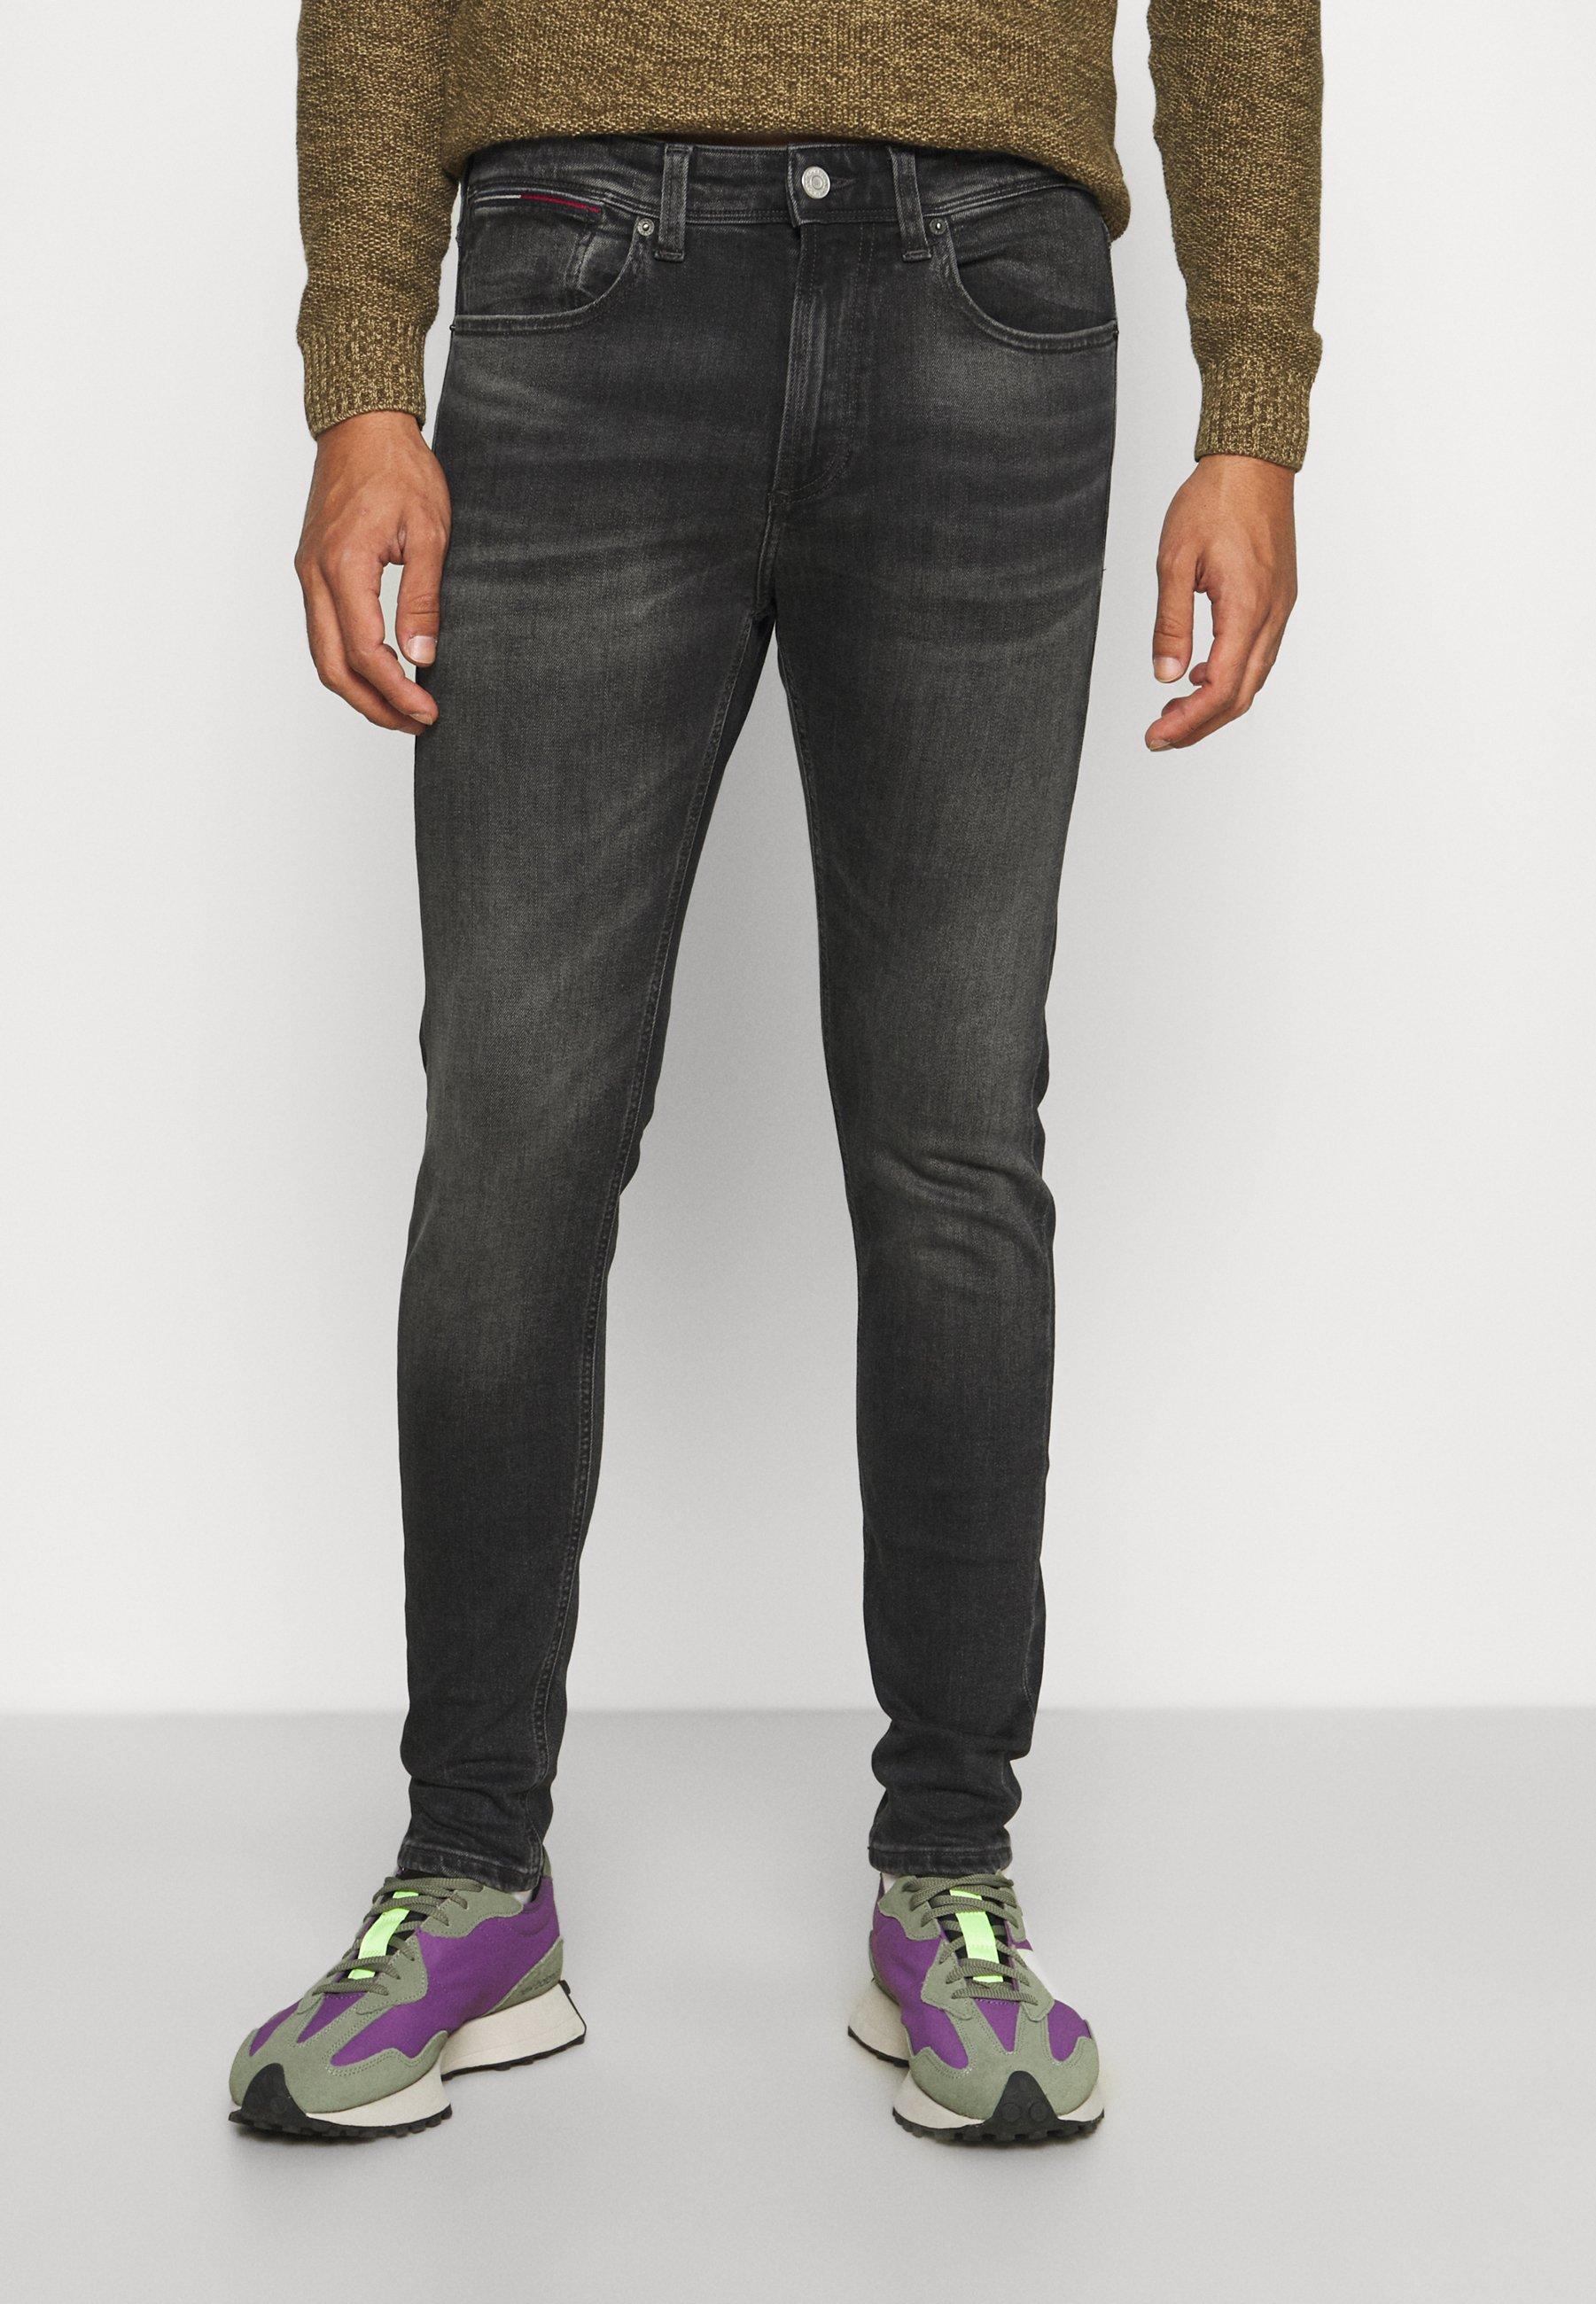 Uomo MILES - Jeans slim fit